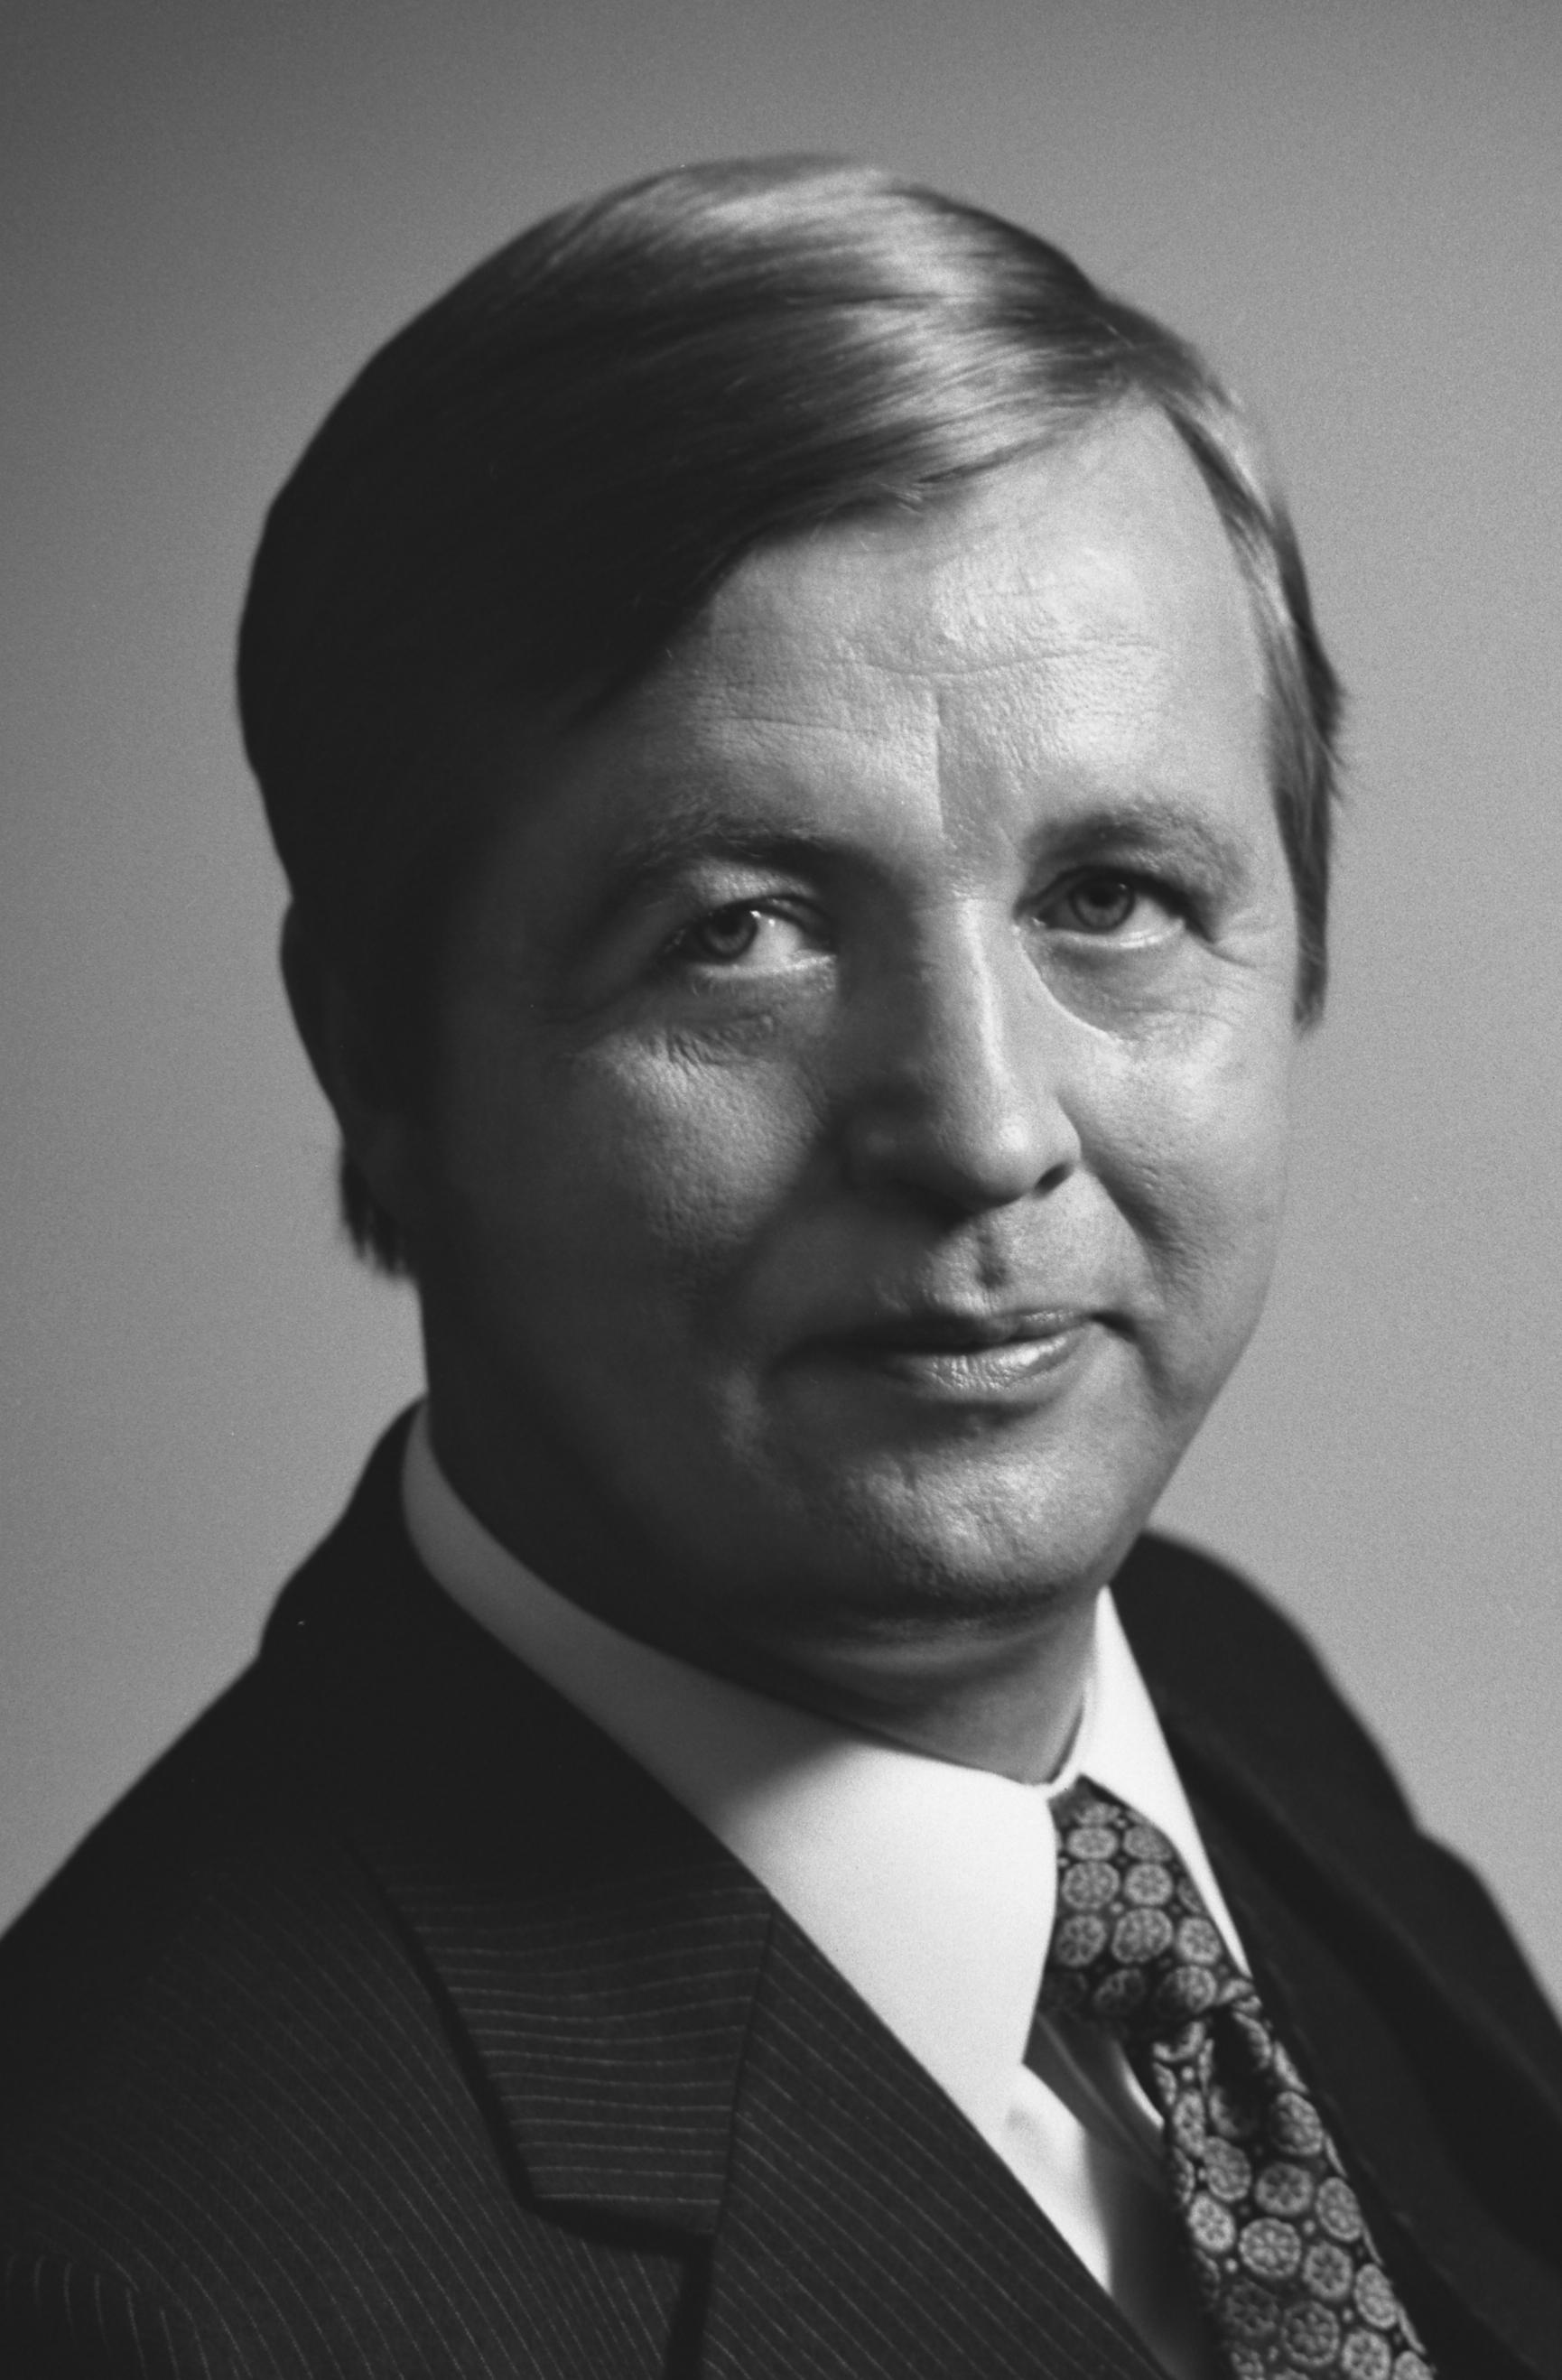 Kalevi-Sorsa-1975 (cropped).jpg